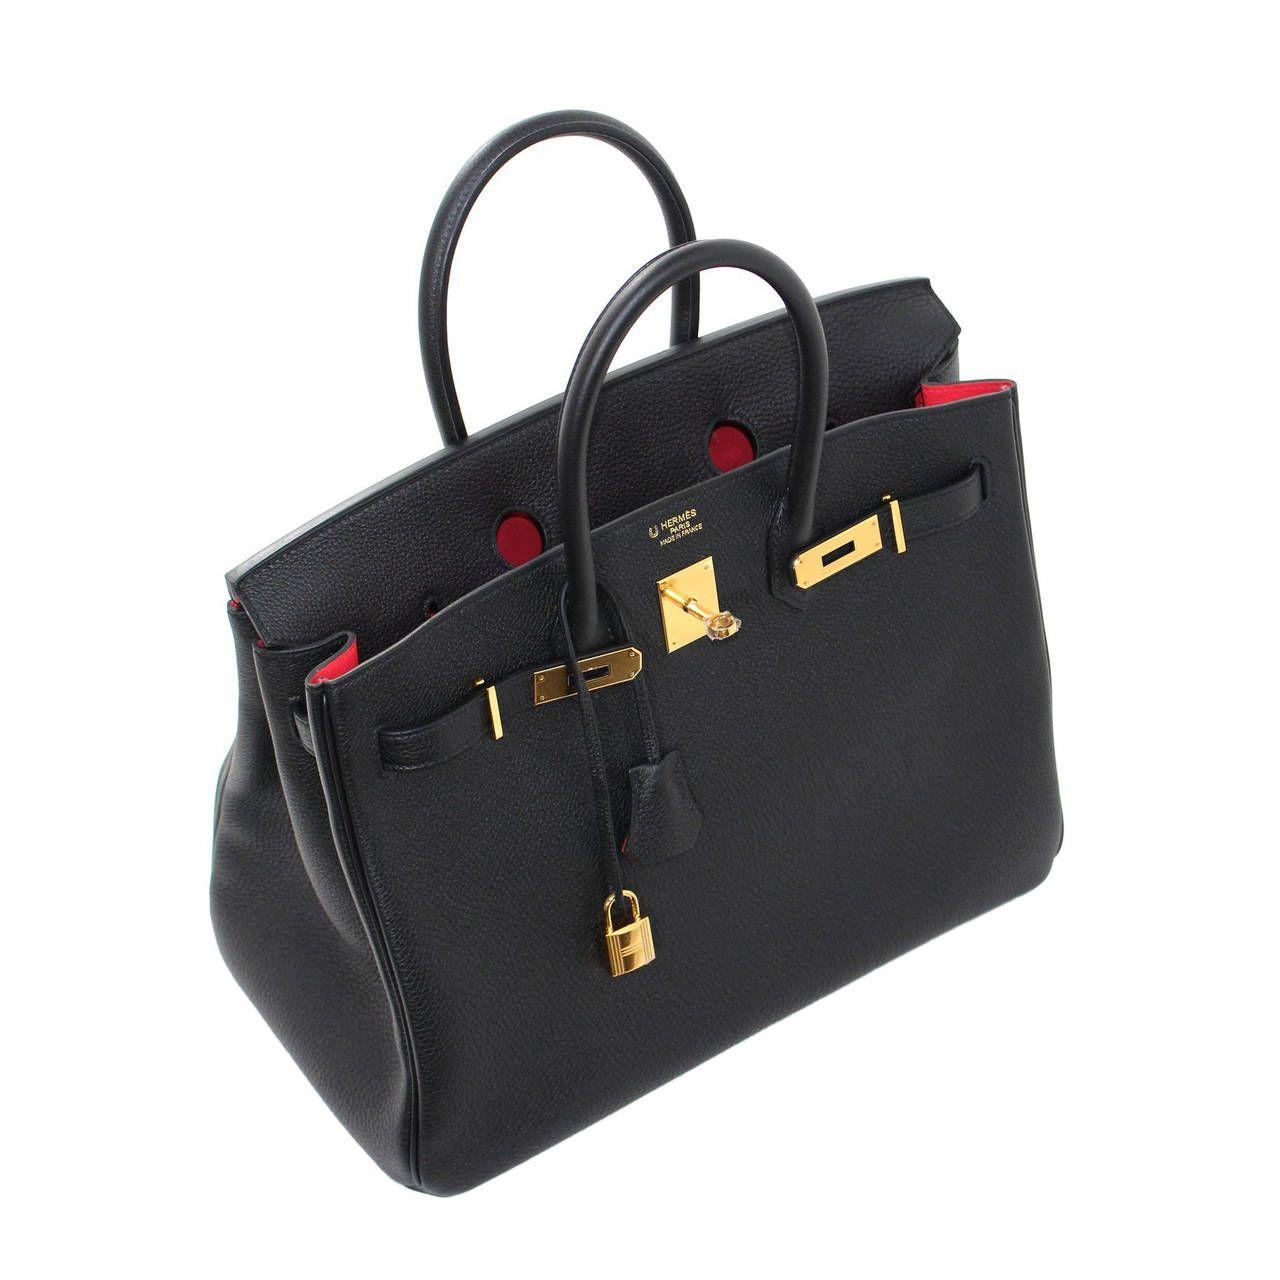 09915fd511cb Hermès Horseshoe Birkin Bag in Black Togo with Rose Jaipur